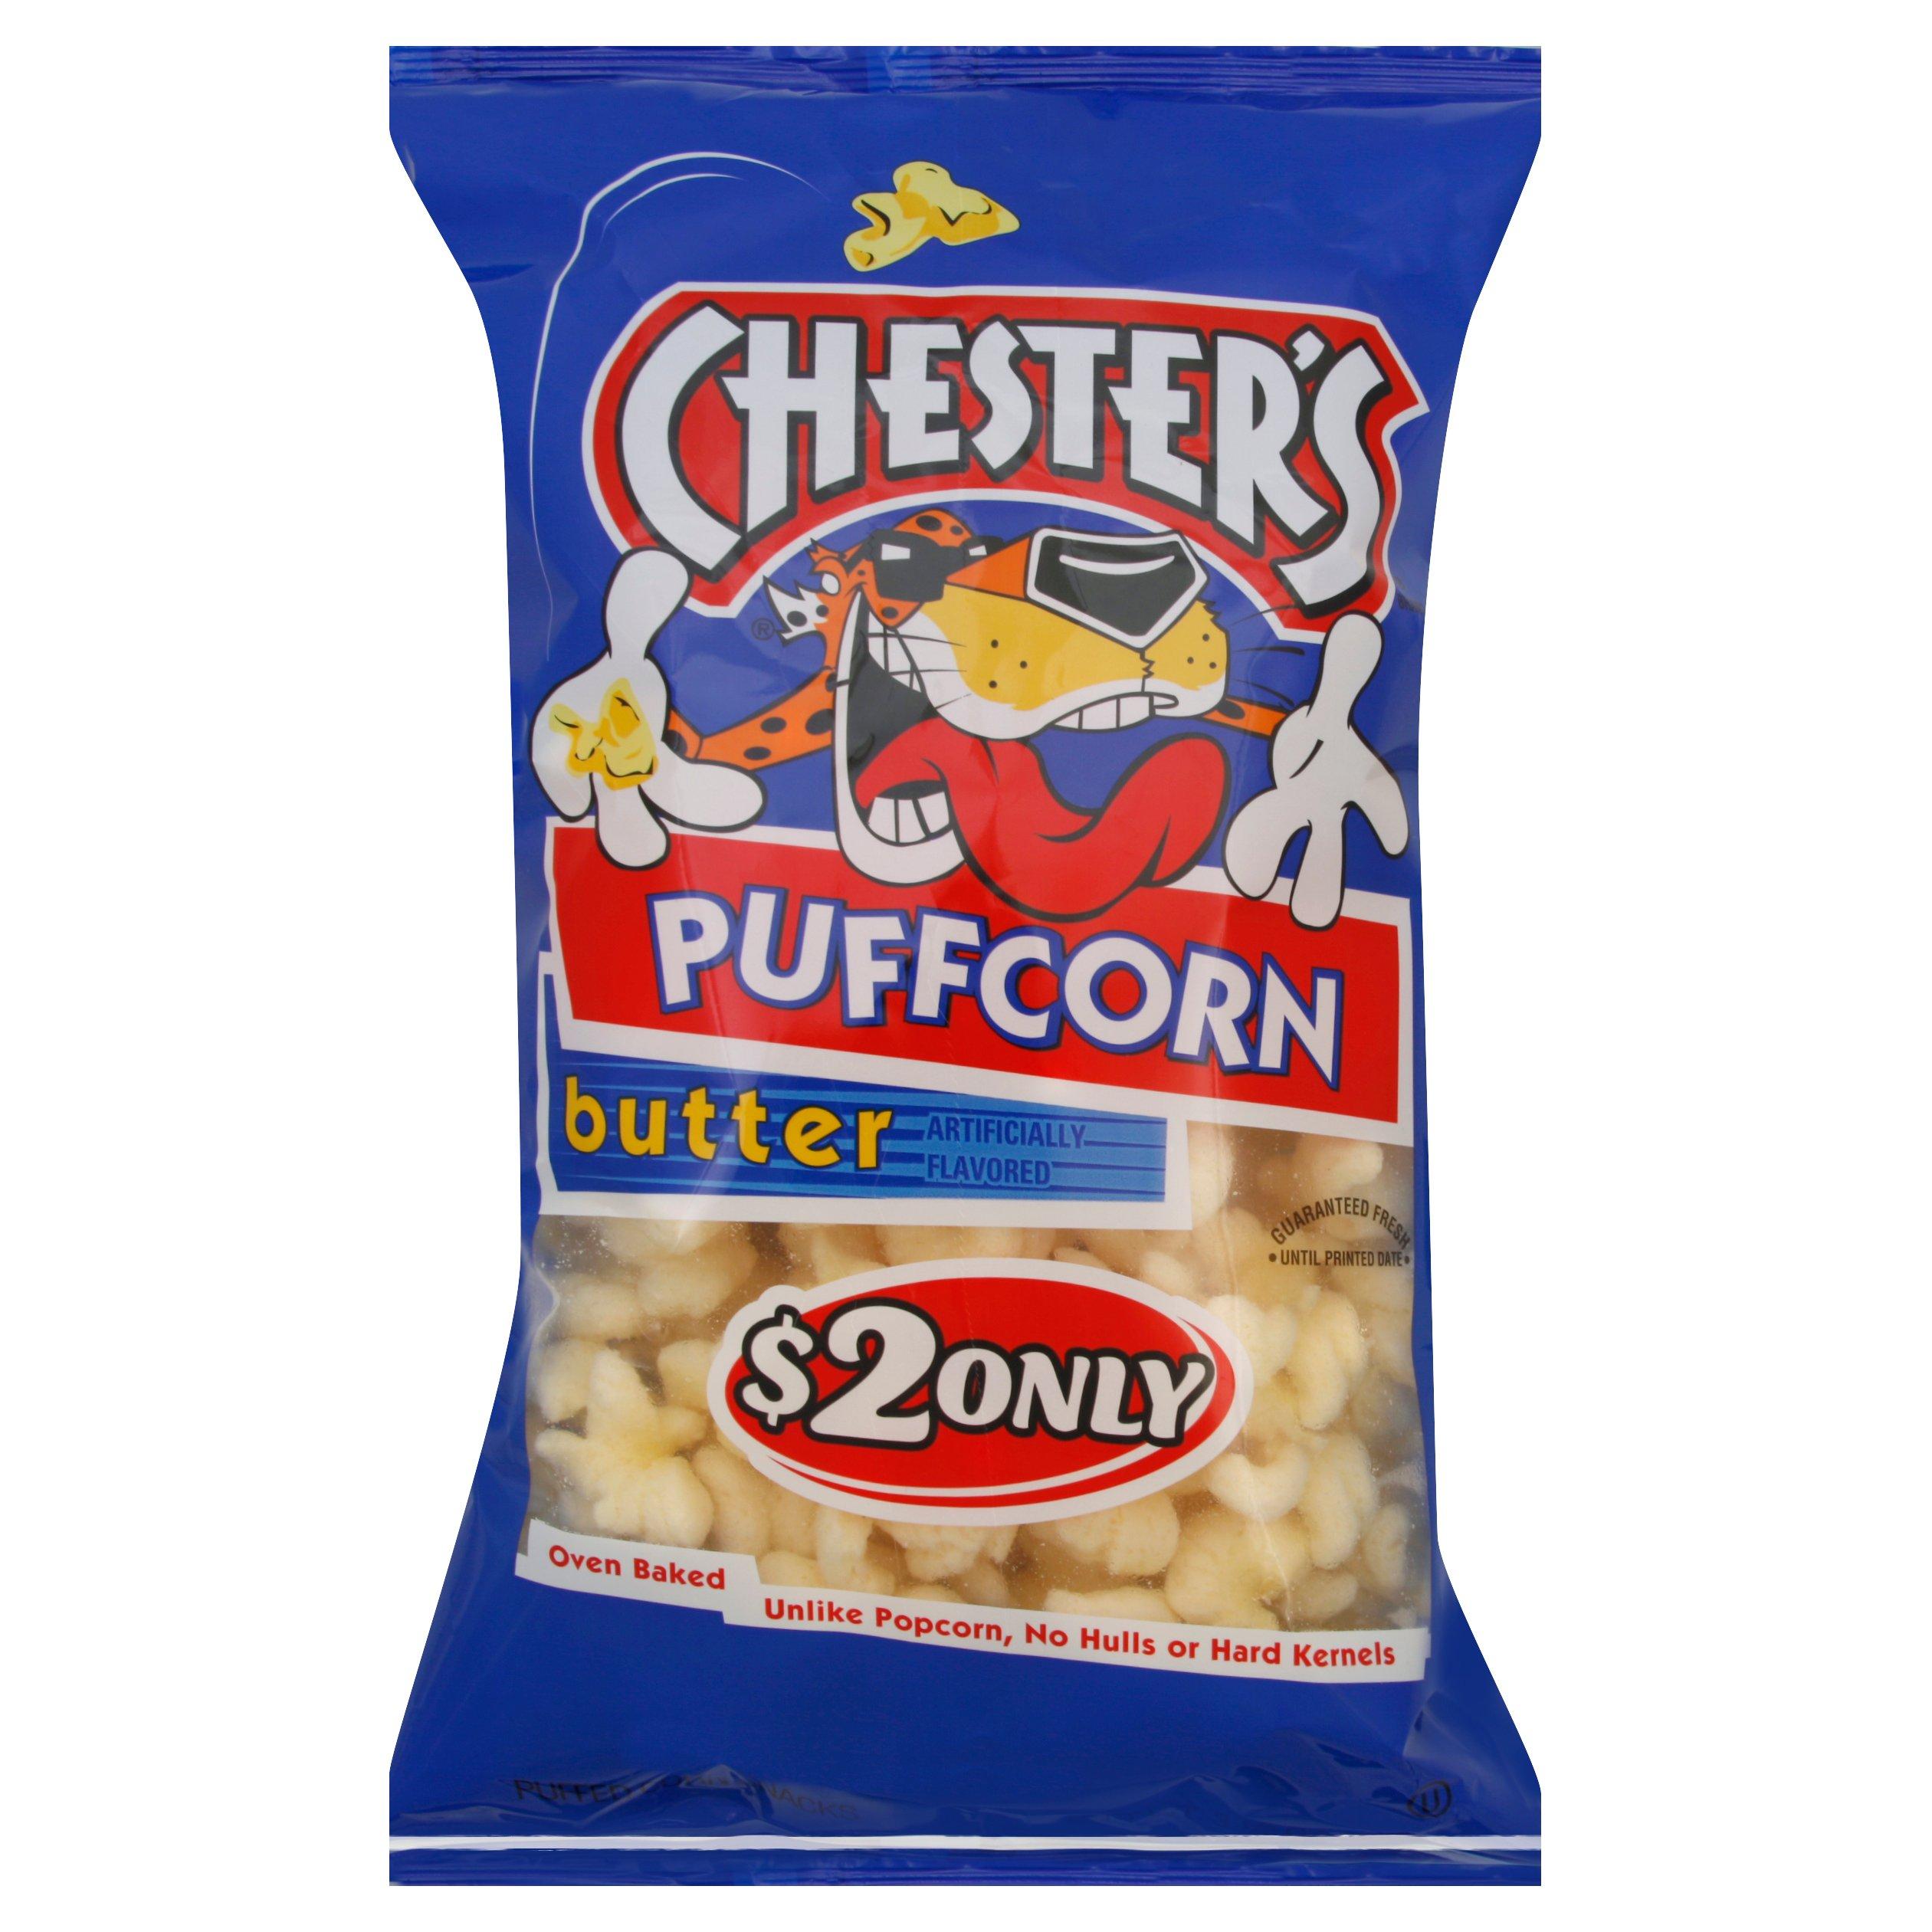 Chester S Butter Puffcorn Shop Chips At H E B